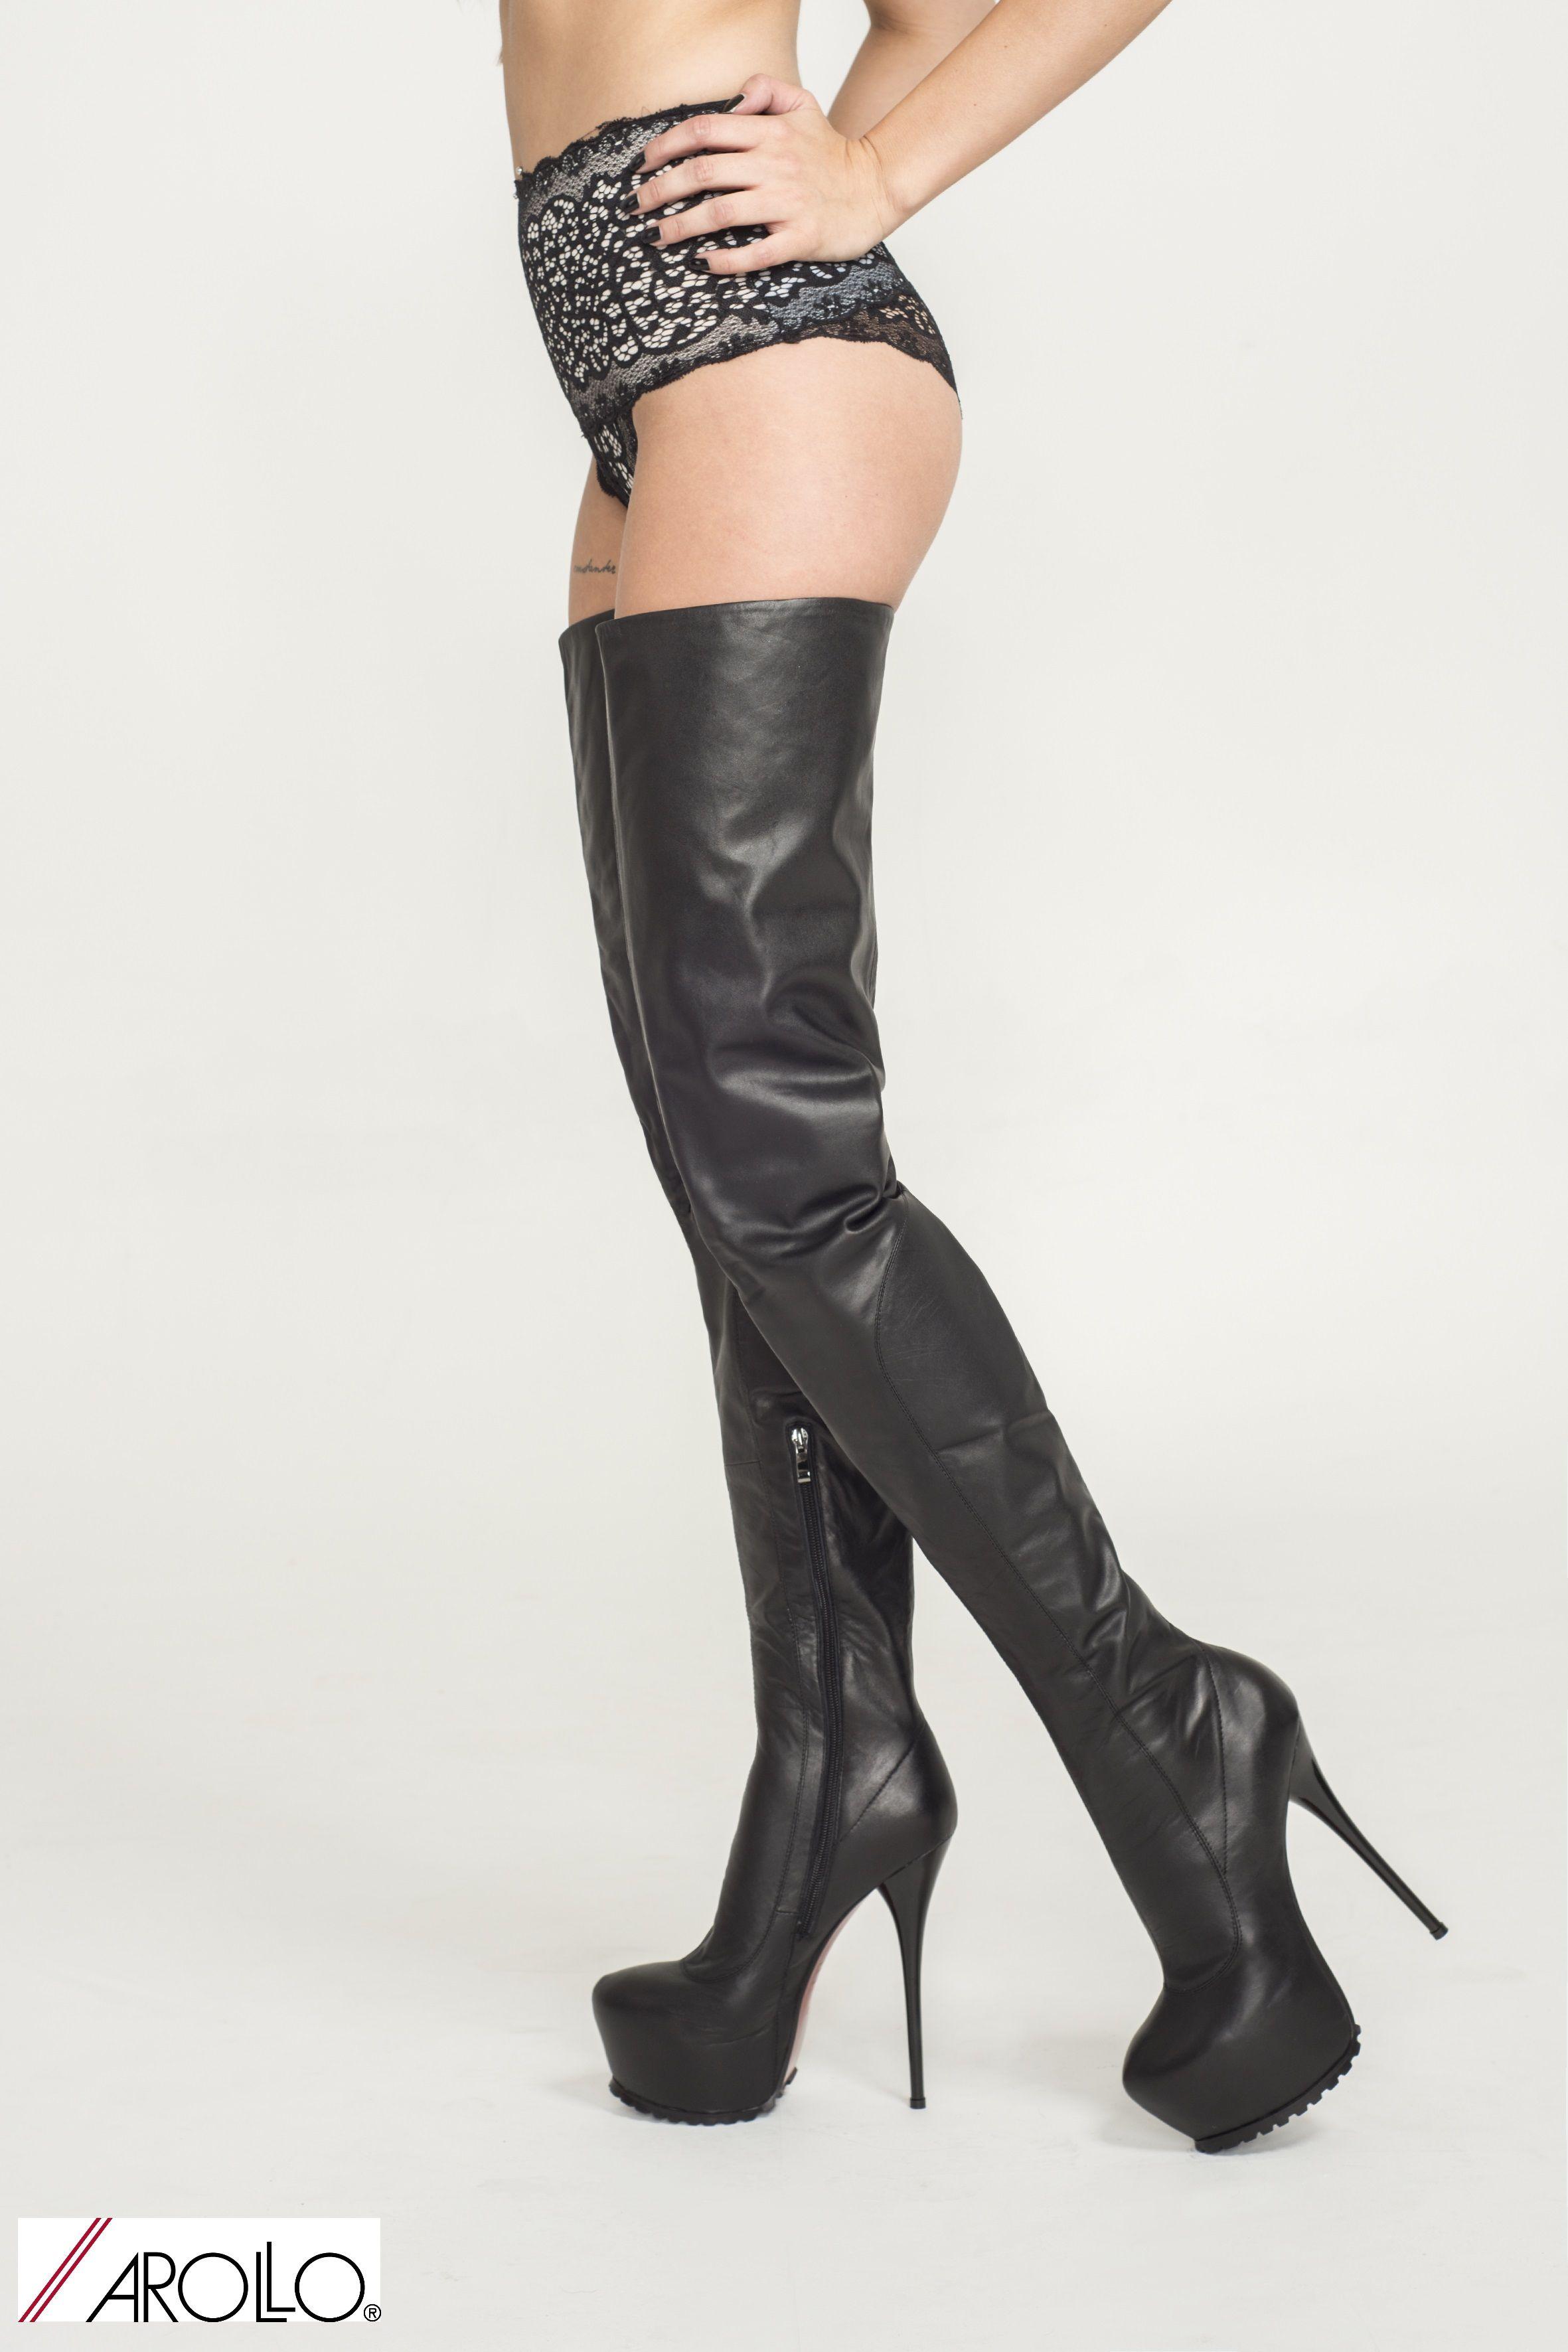 fc7b3ef09ba739 AROLLO Thigh High Crotch Boots ANNA2 Special Edition www.overknee-stiefel .net